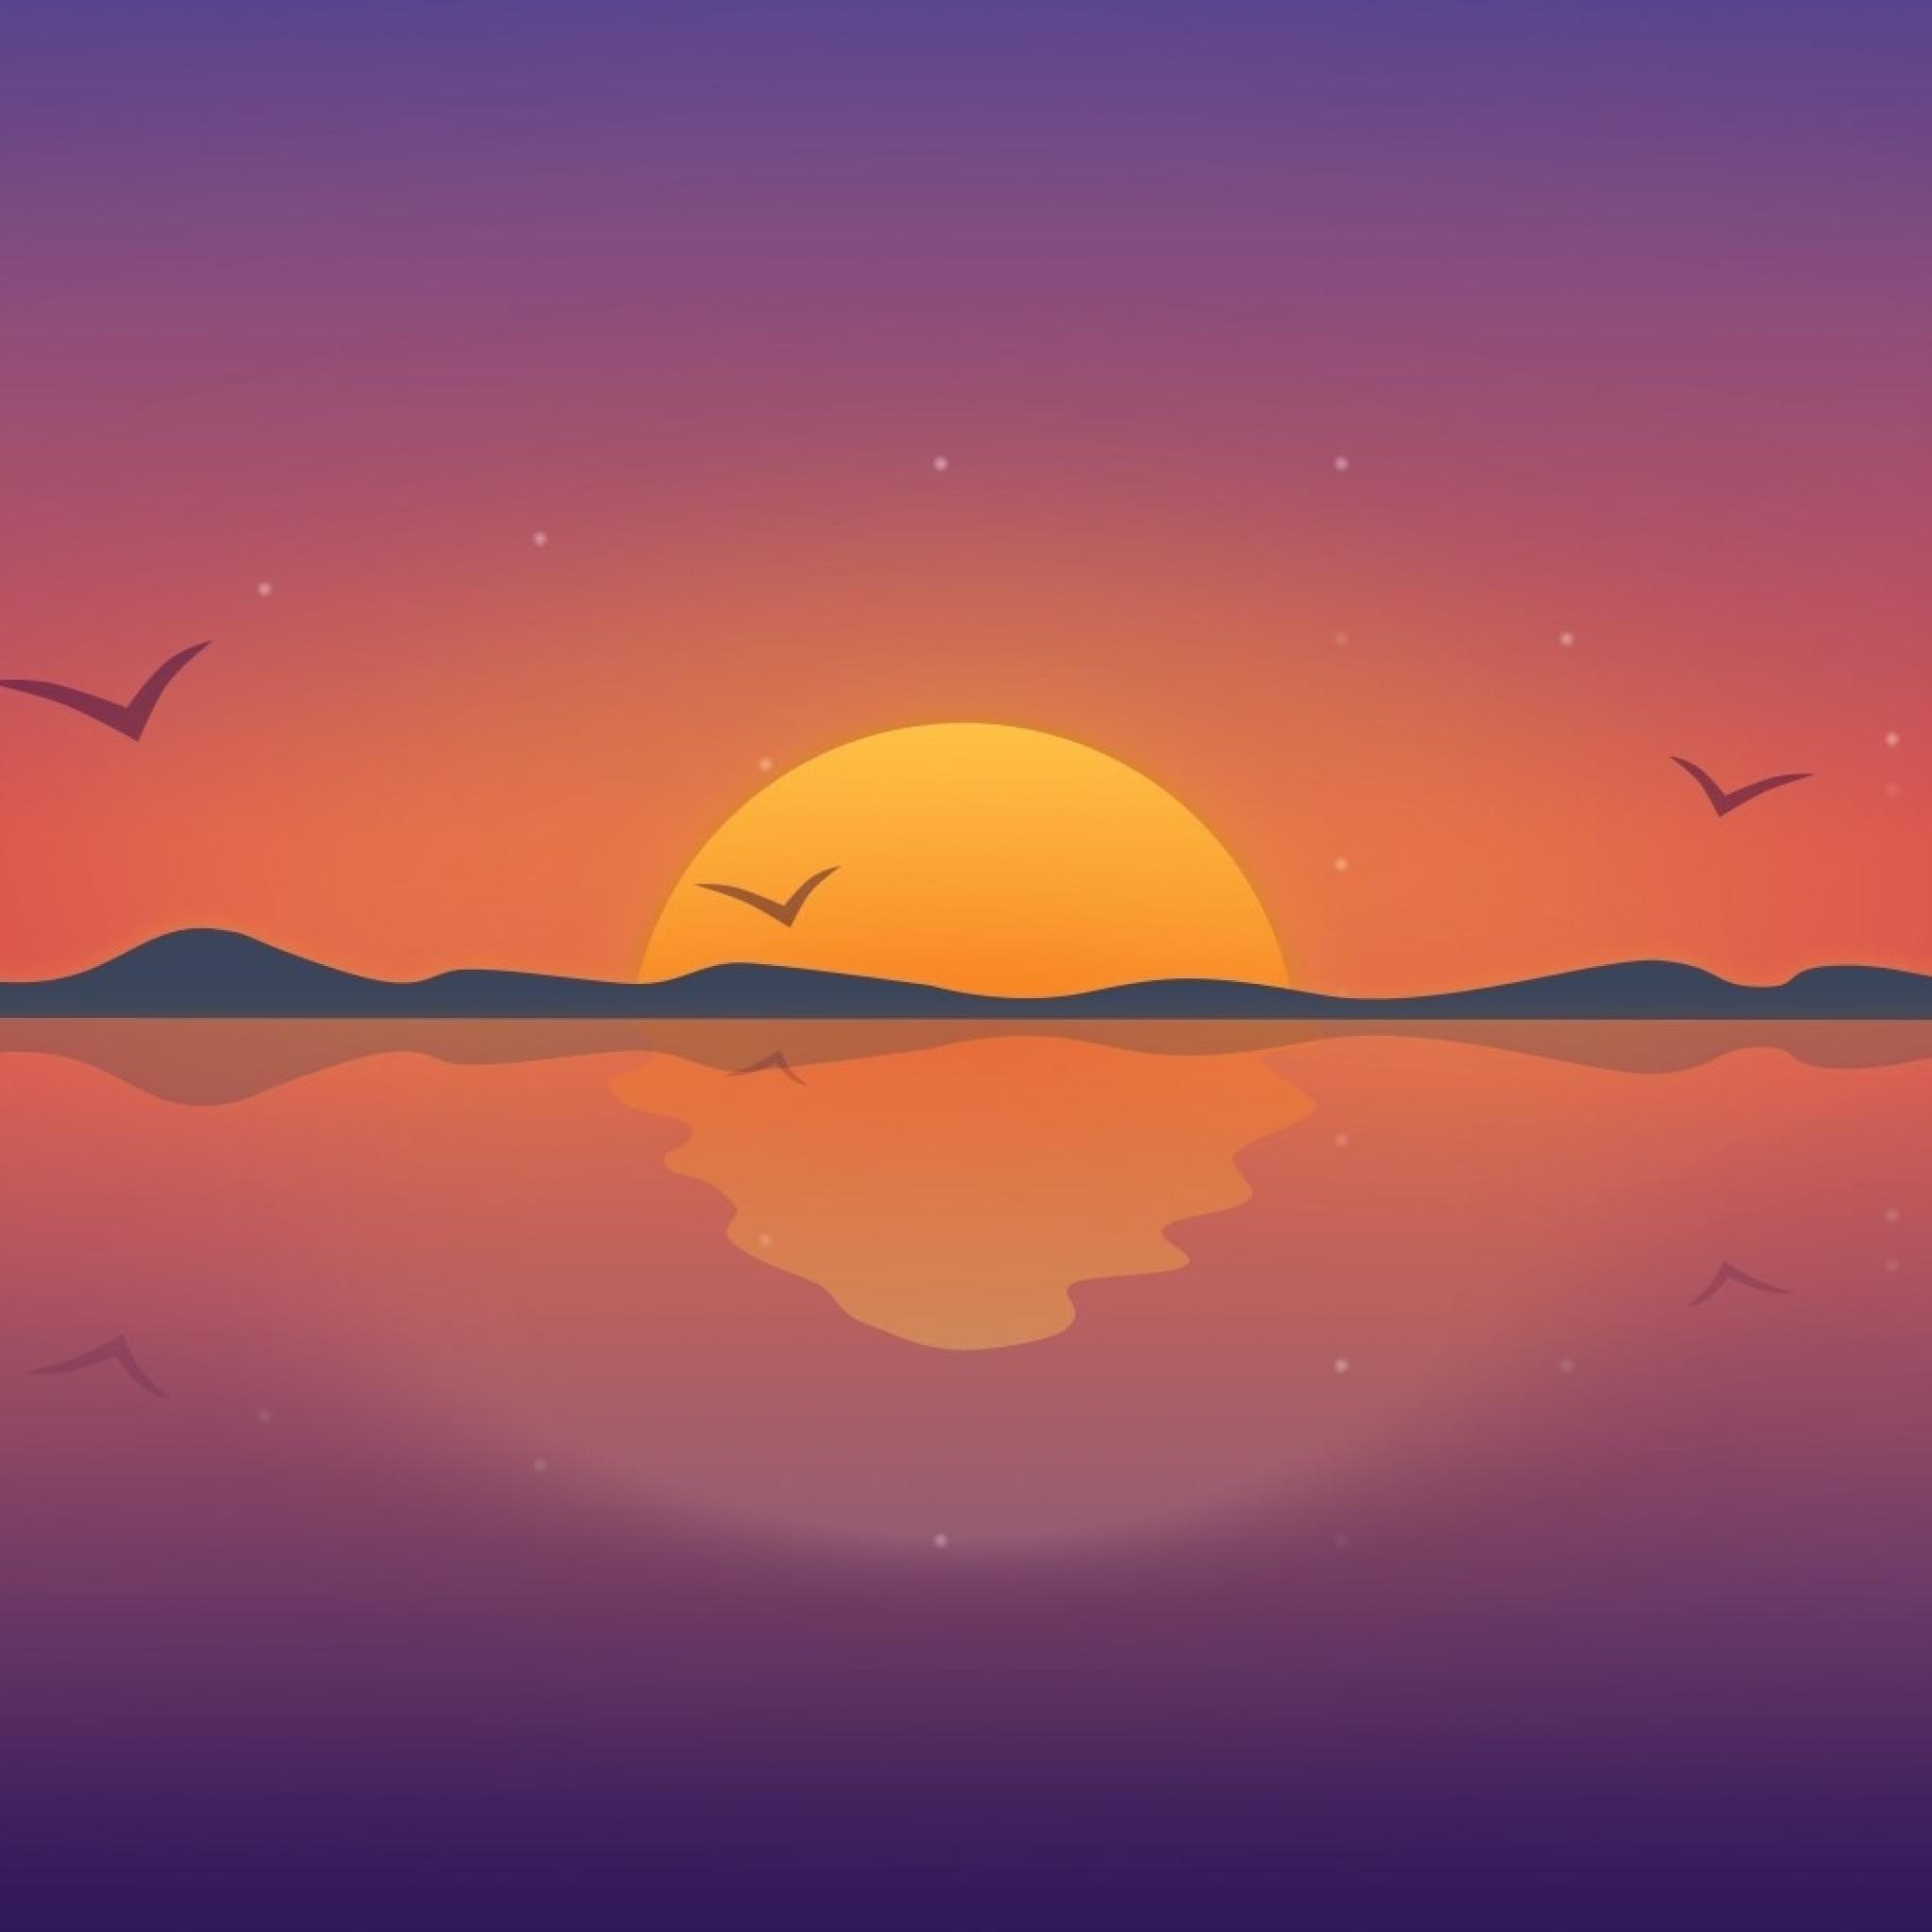 2048x2048 Minimal Reflection Sunset Ipad Air Wallpaper, HD ...